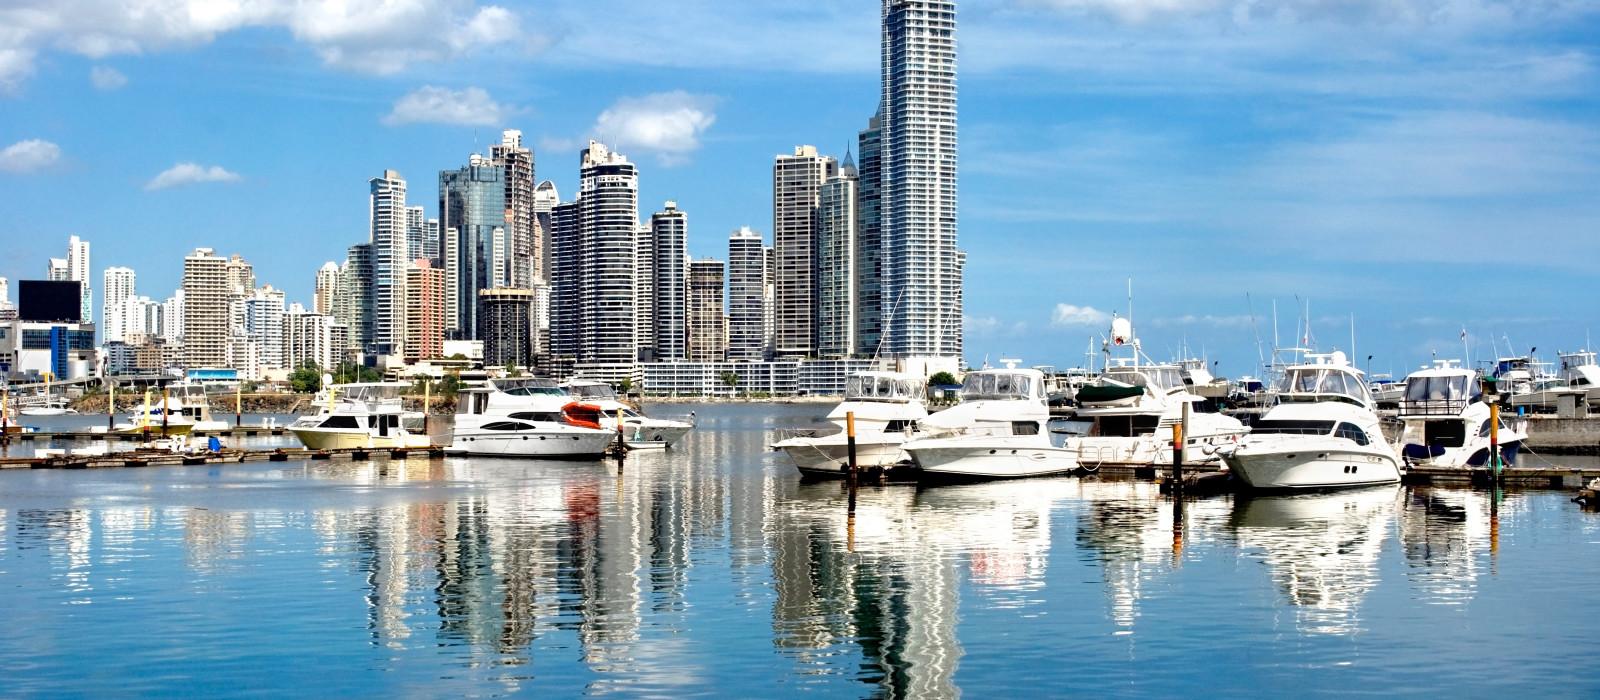 Reiseziel Panama Stadt Panama